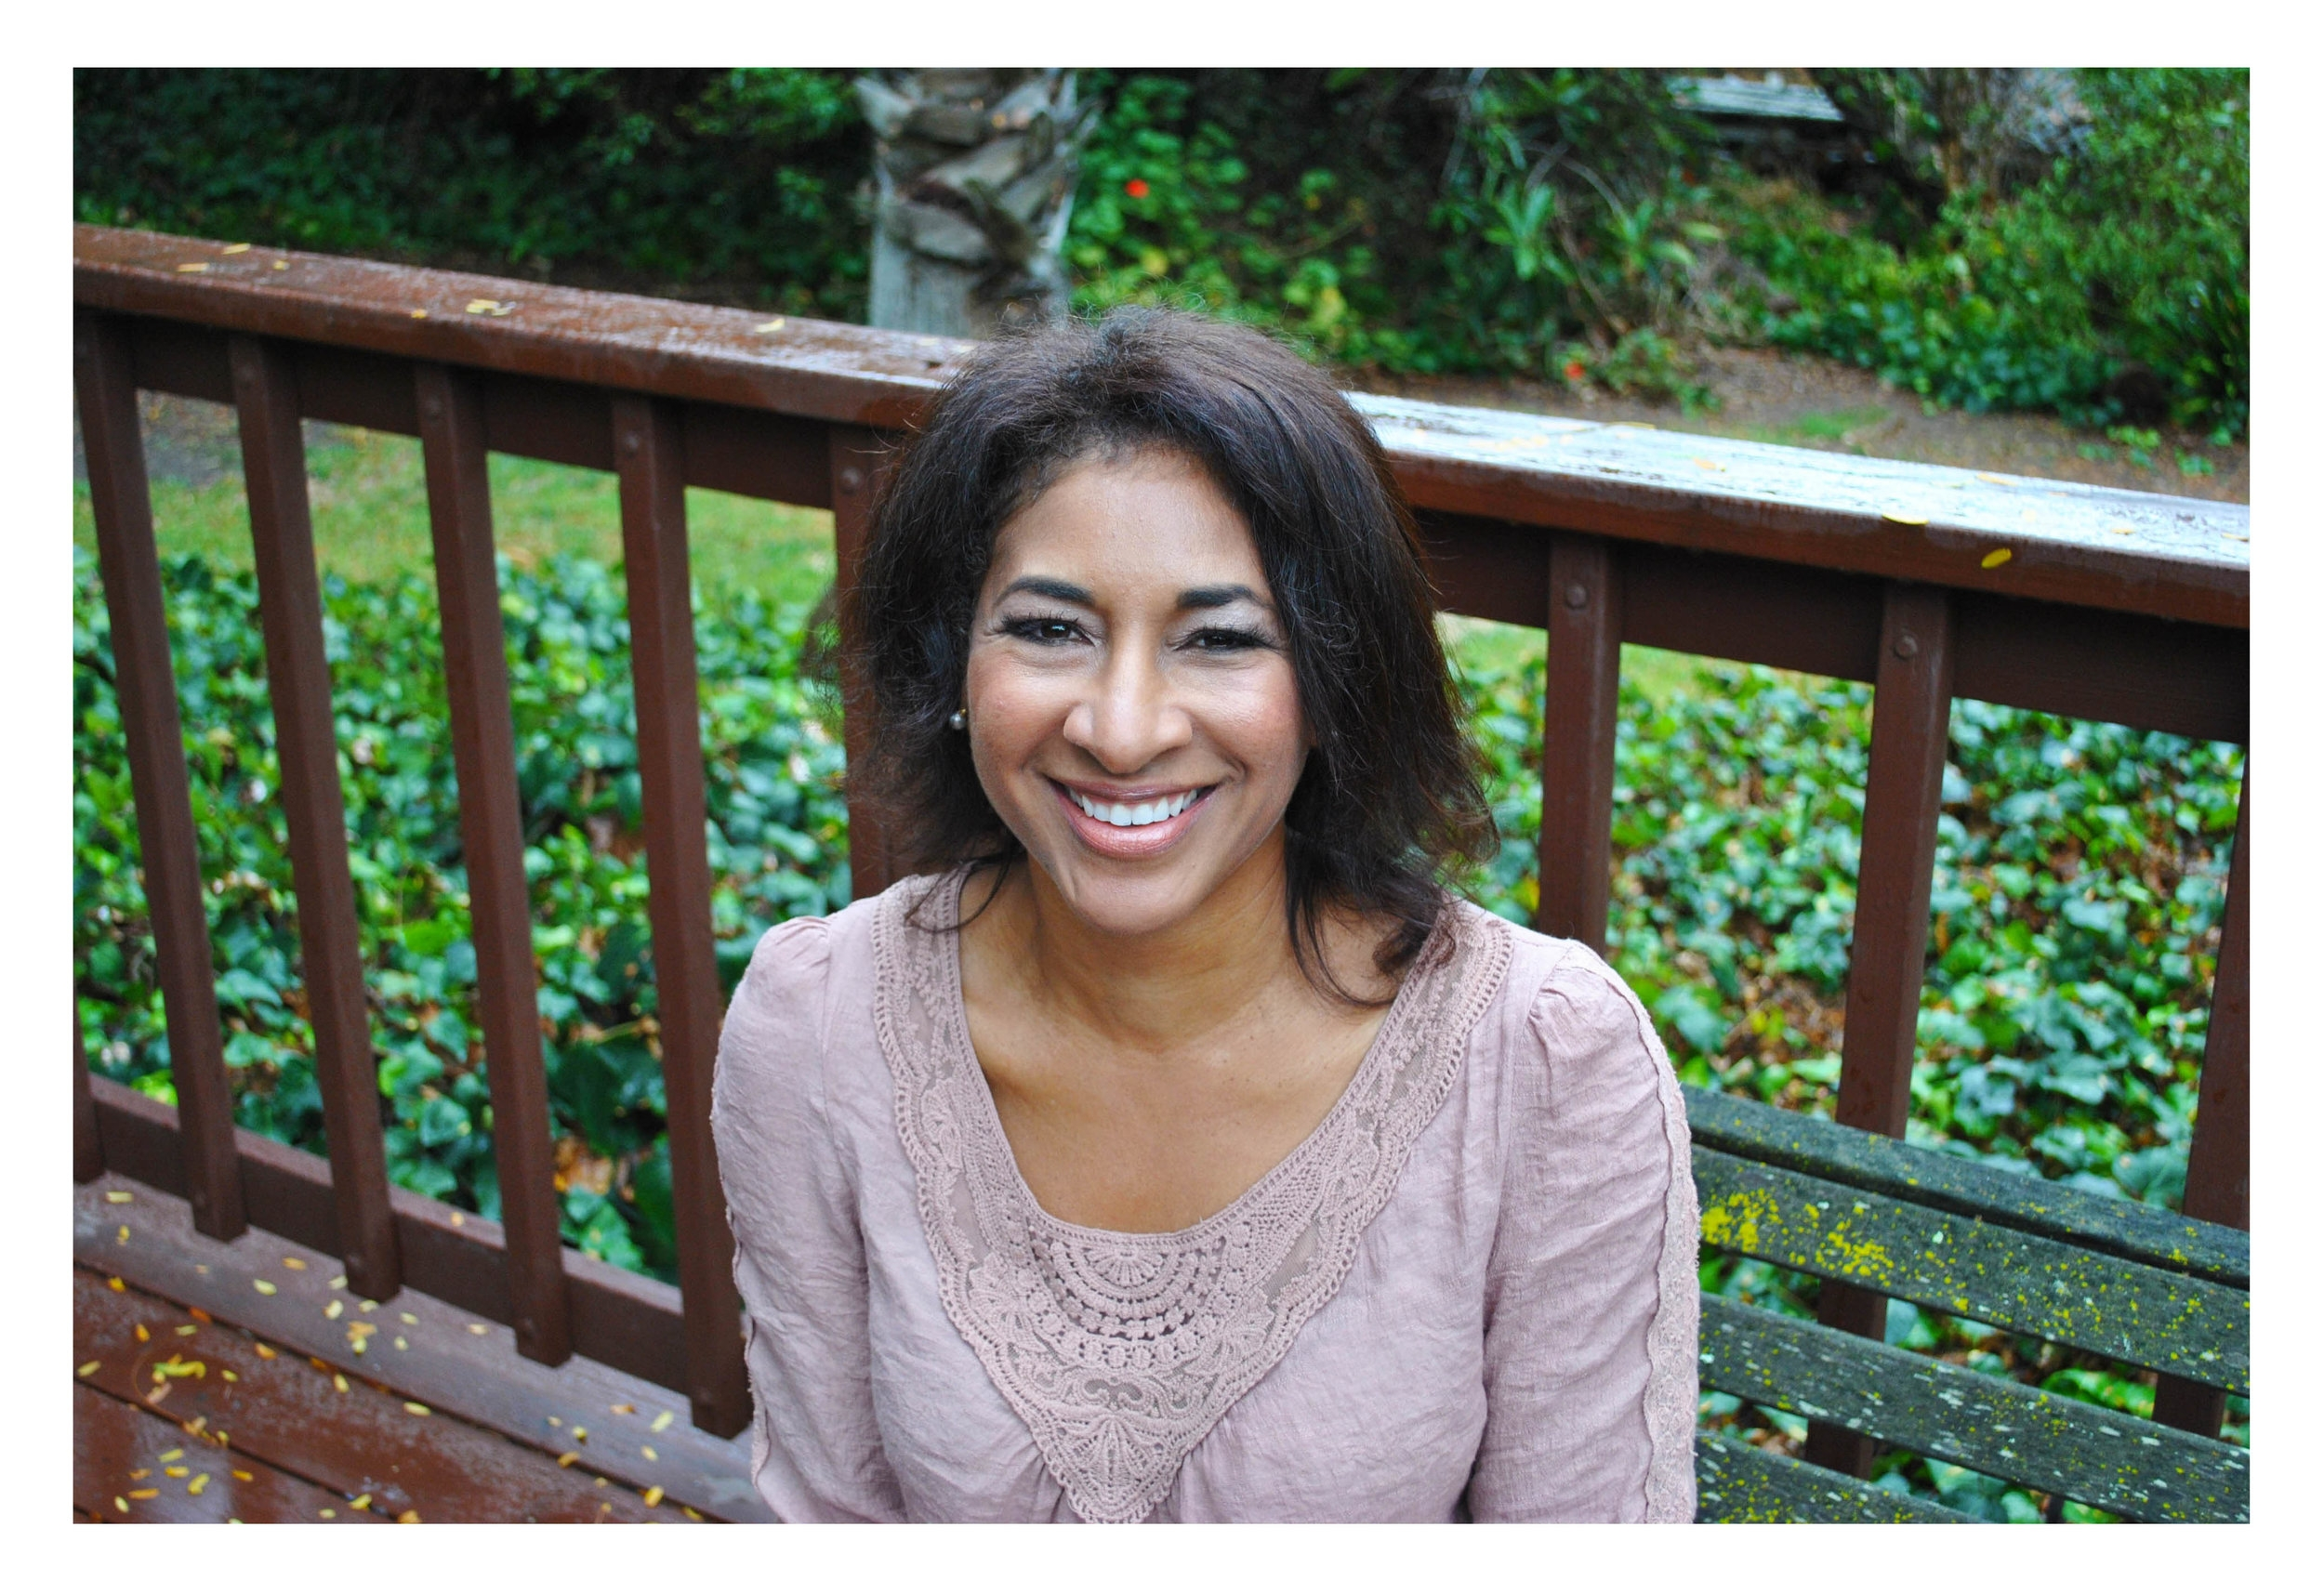 Phyllis Padilla - Board Certified Massage TherapistCMTC#10490Degree in PsychologyFounder of BodyReviveWellness